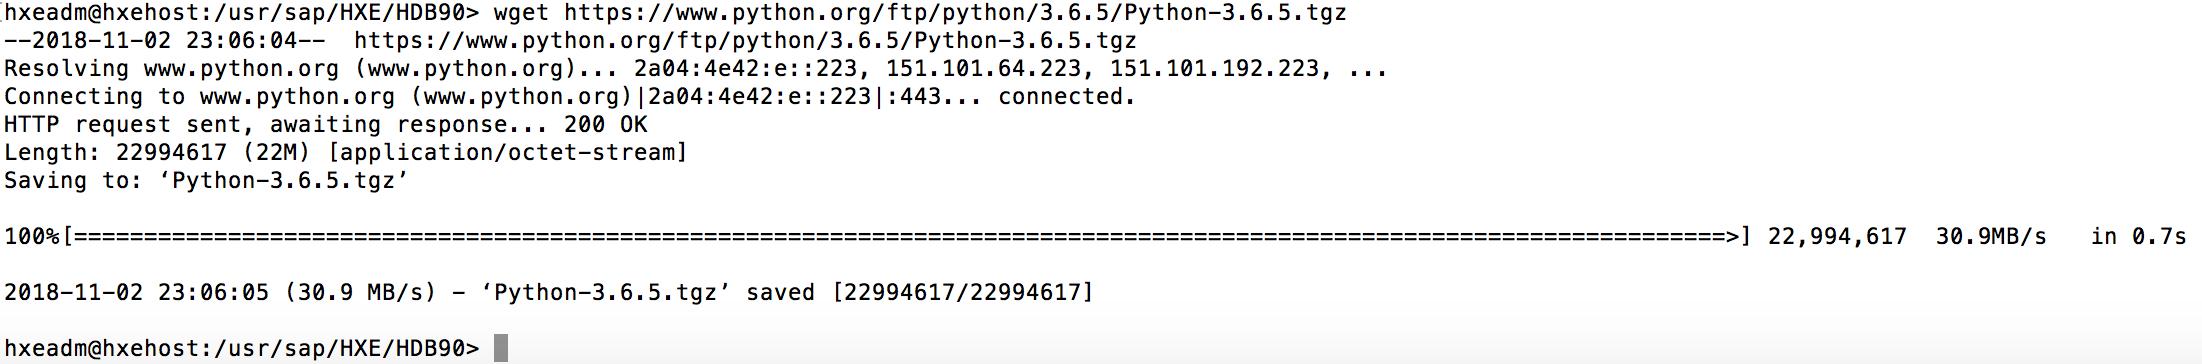 Setting up a HANA Express Python Machine Learning API Demo